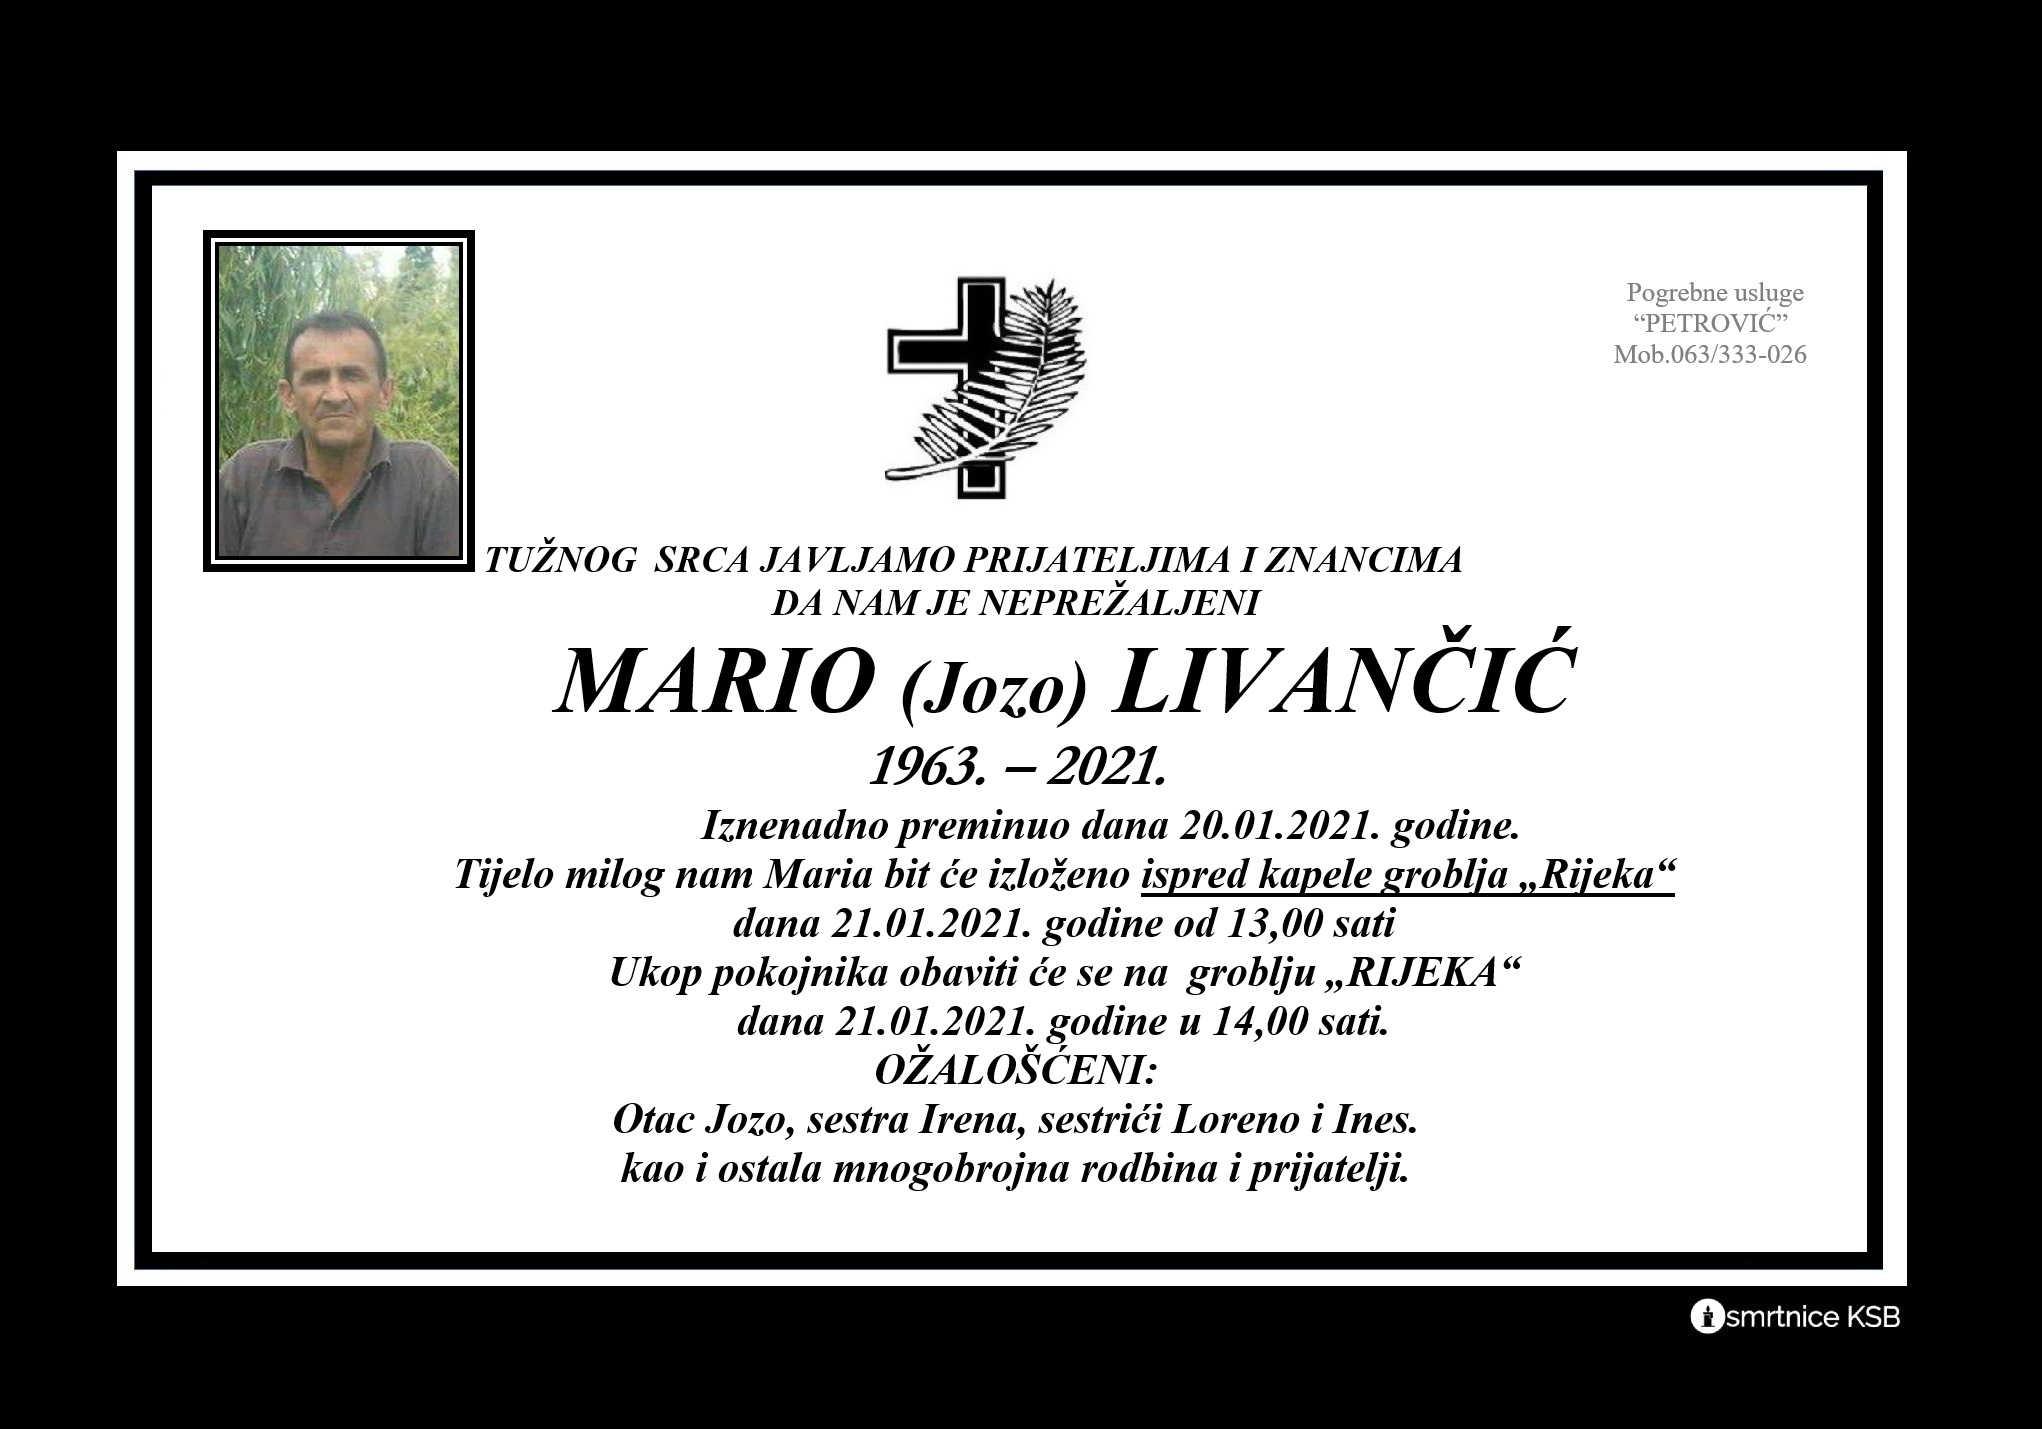 Mario (Jozo) Livančić